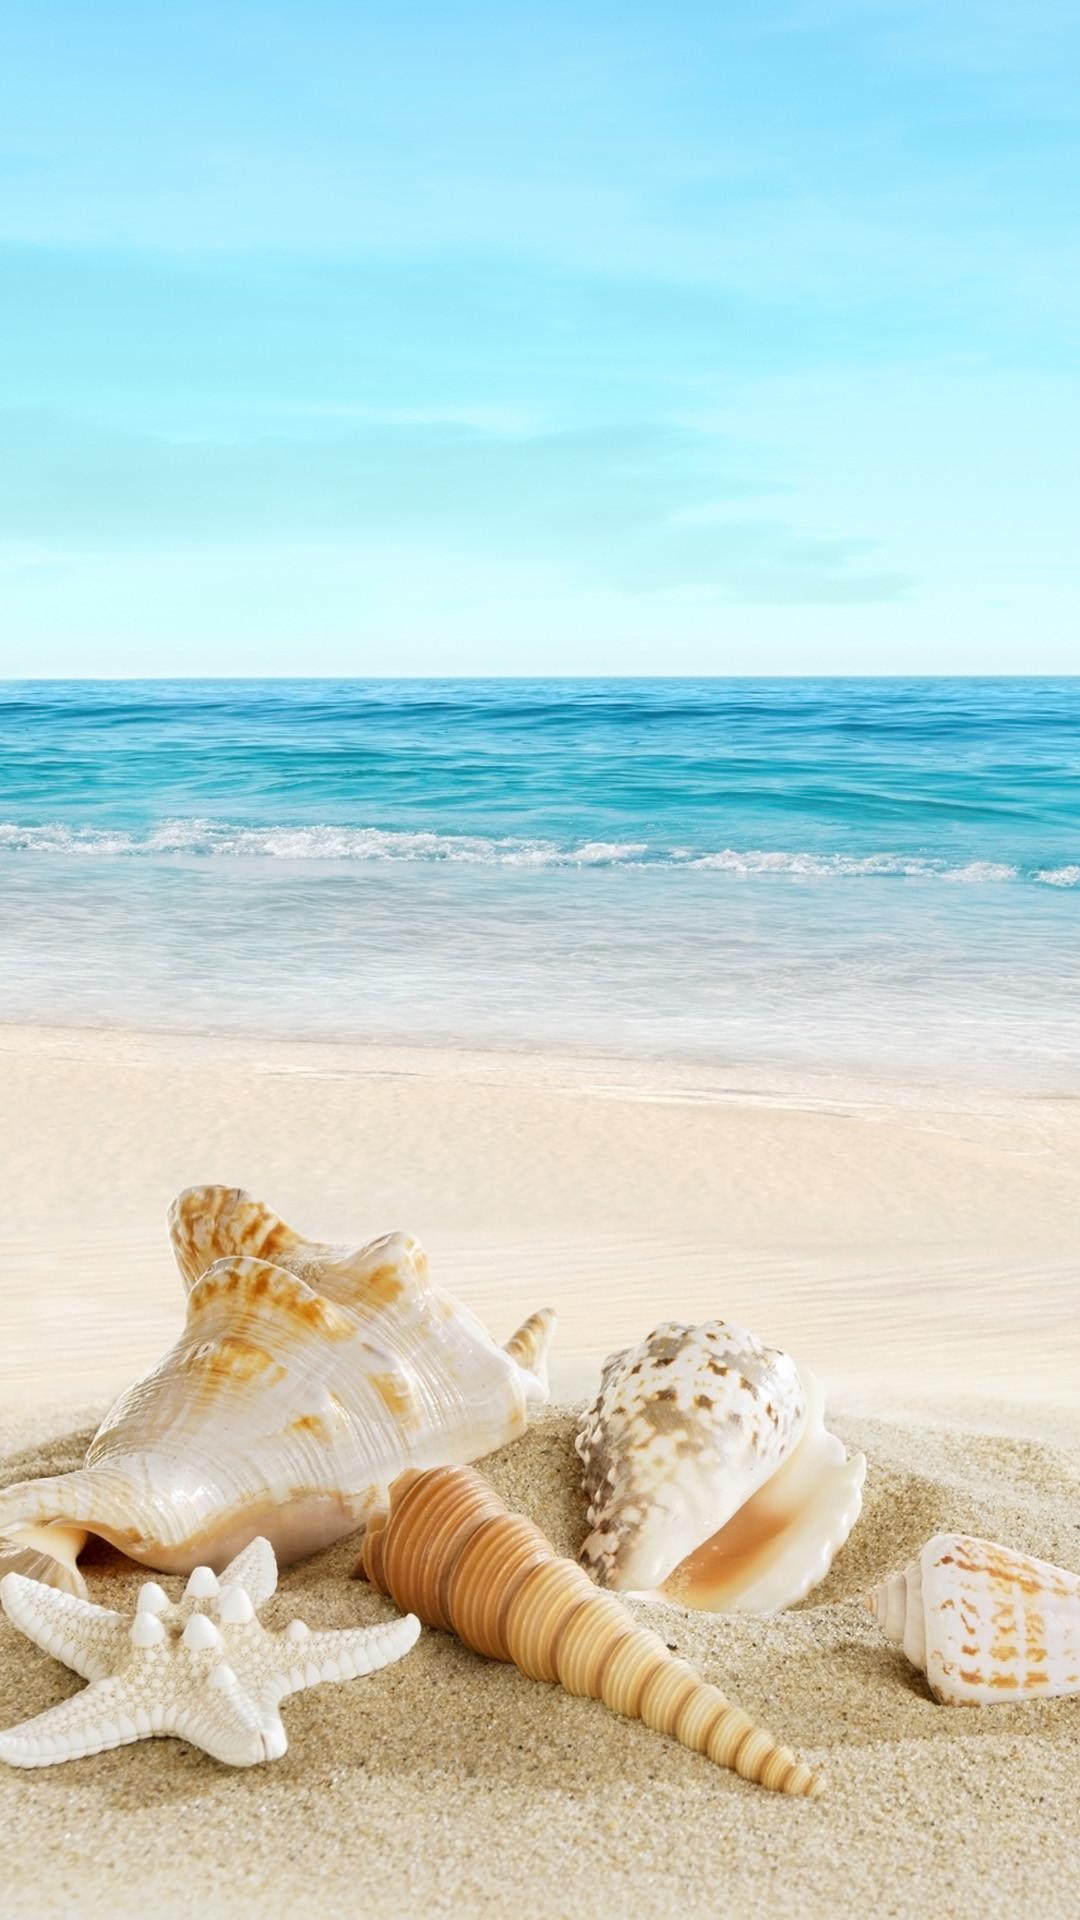 Nature Sunny Sea Shell Beach iPhone 6 wallpaper